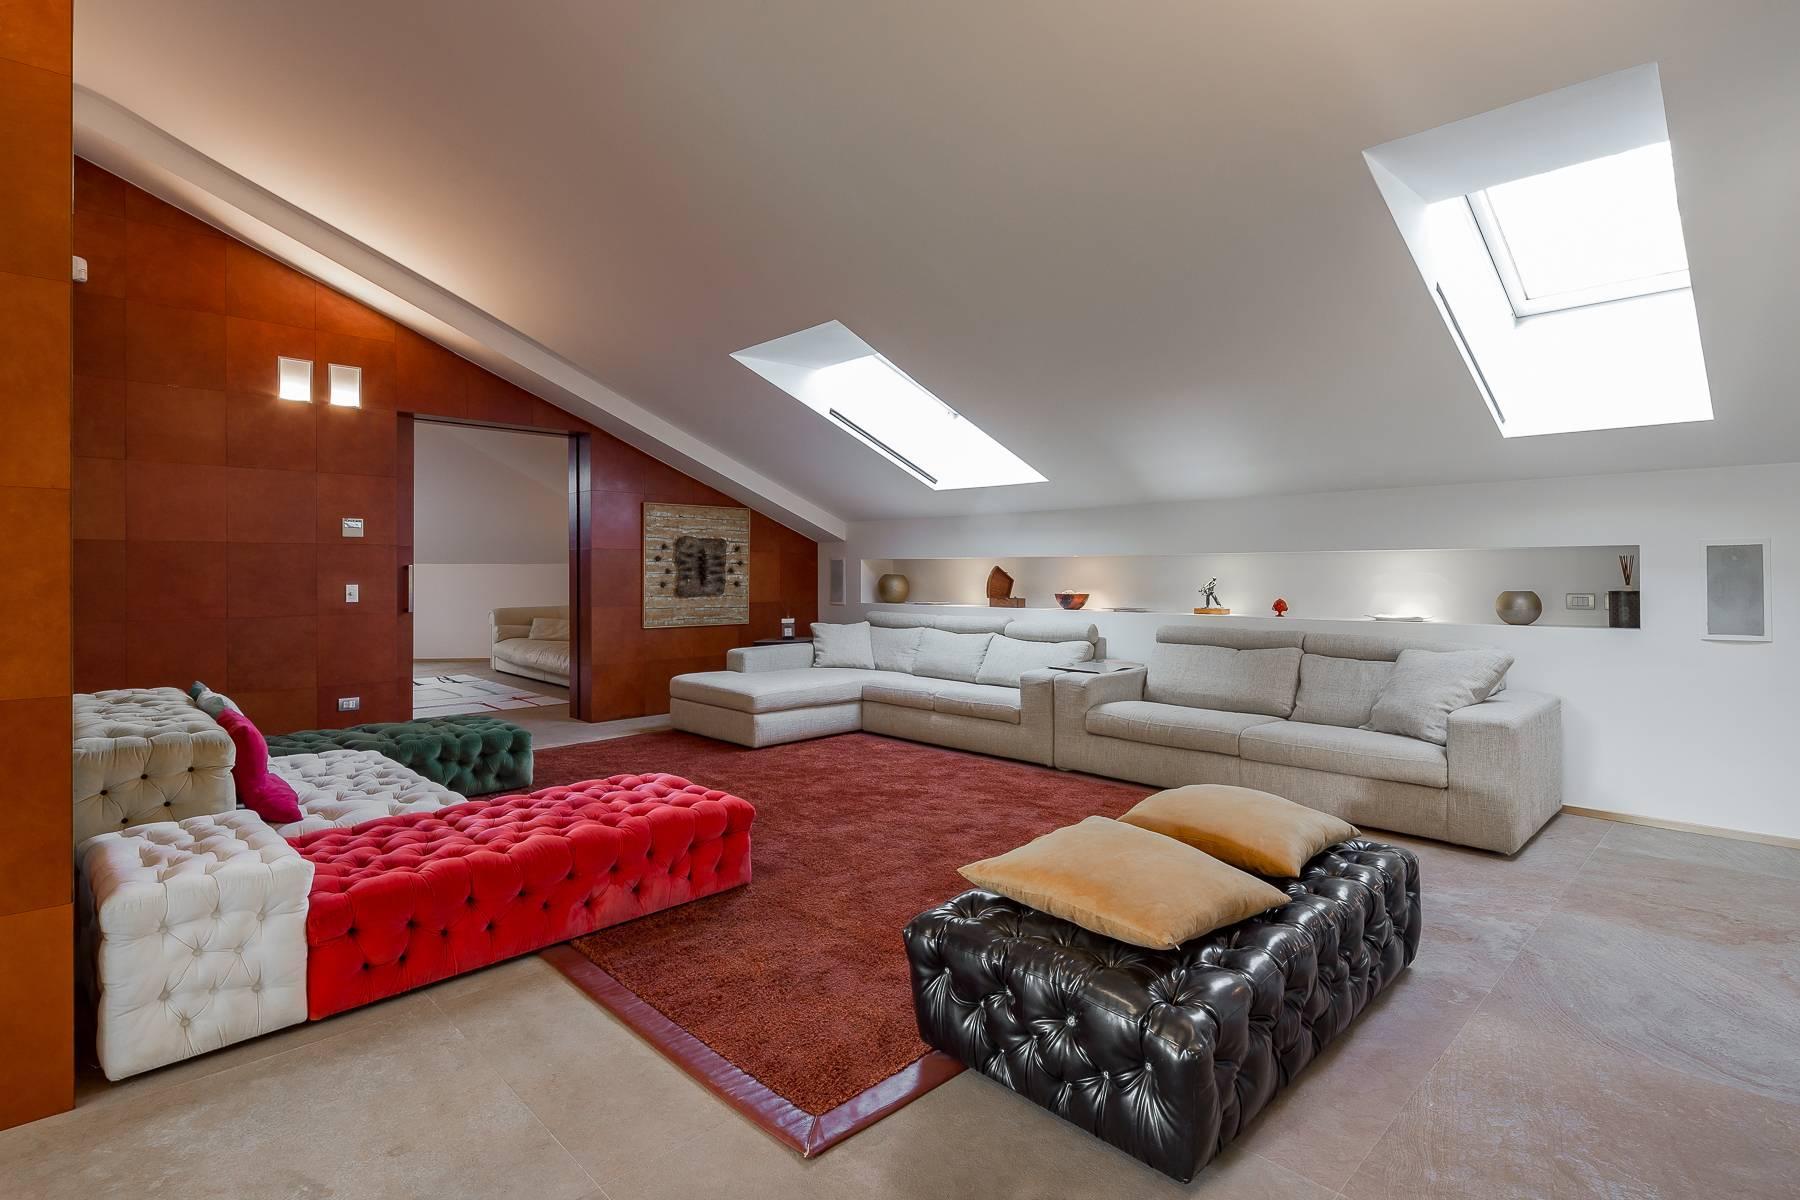 Prestigious penthouse in Piazza Mondadori of 500 square meters - 16